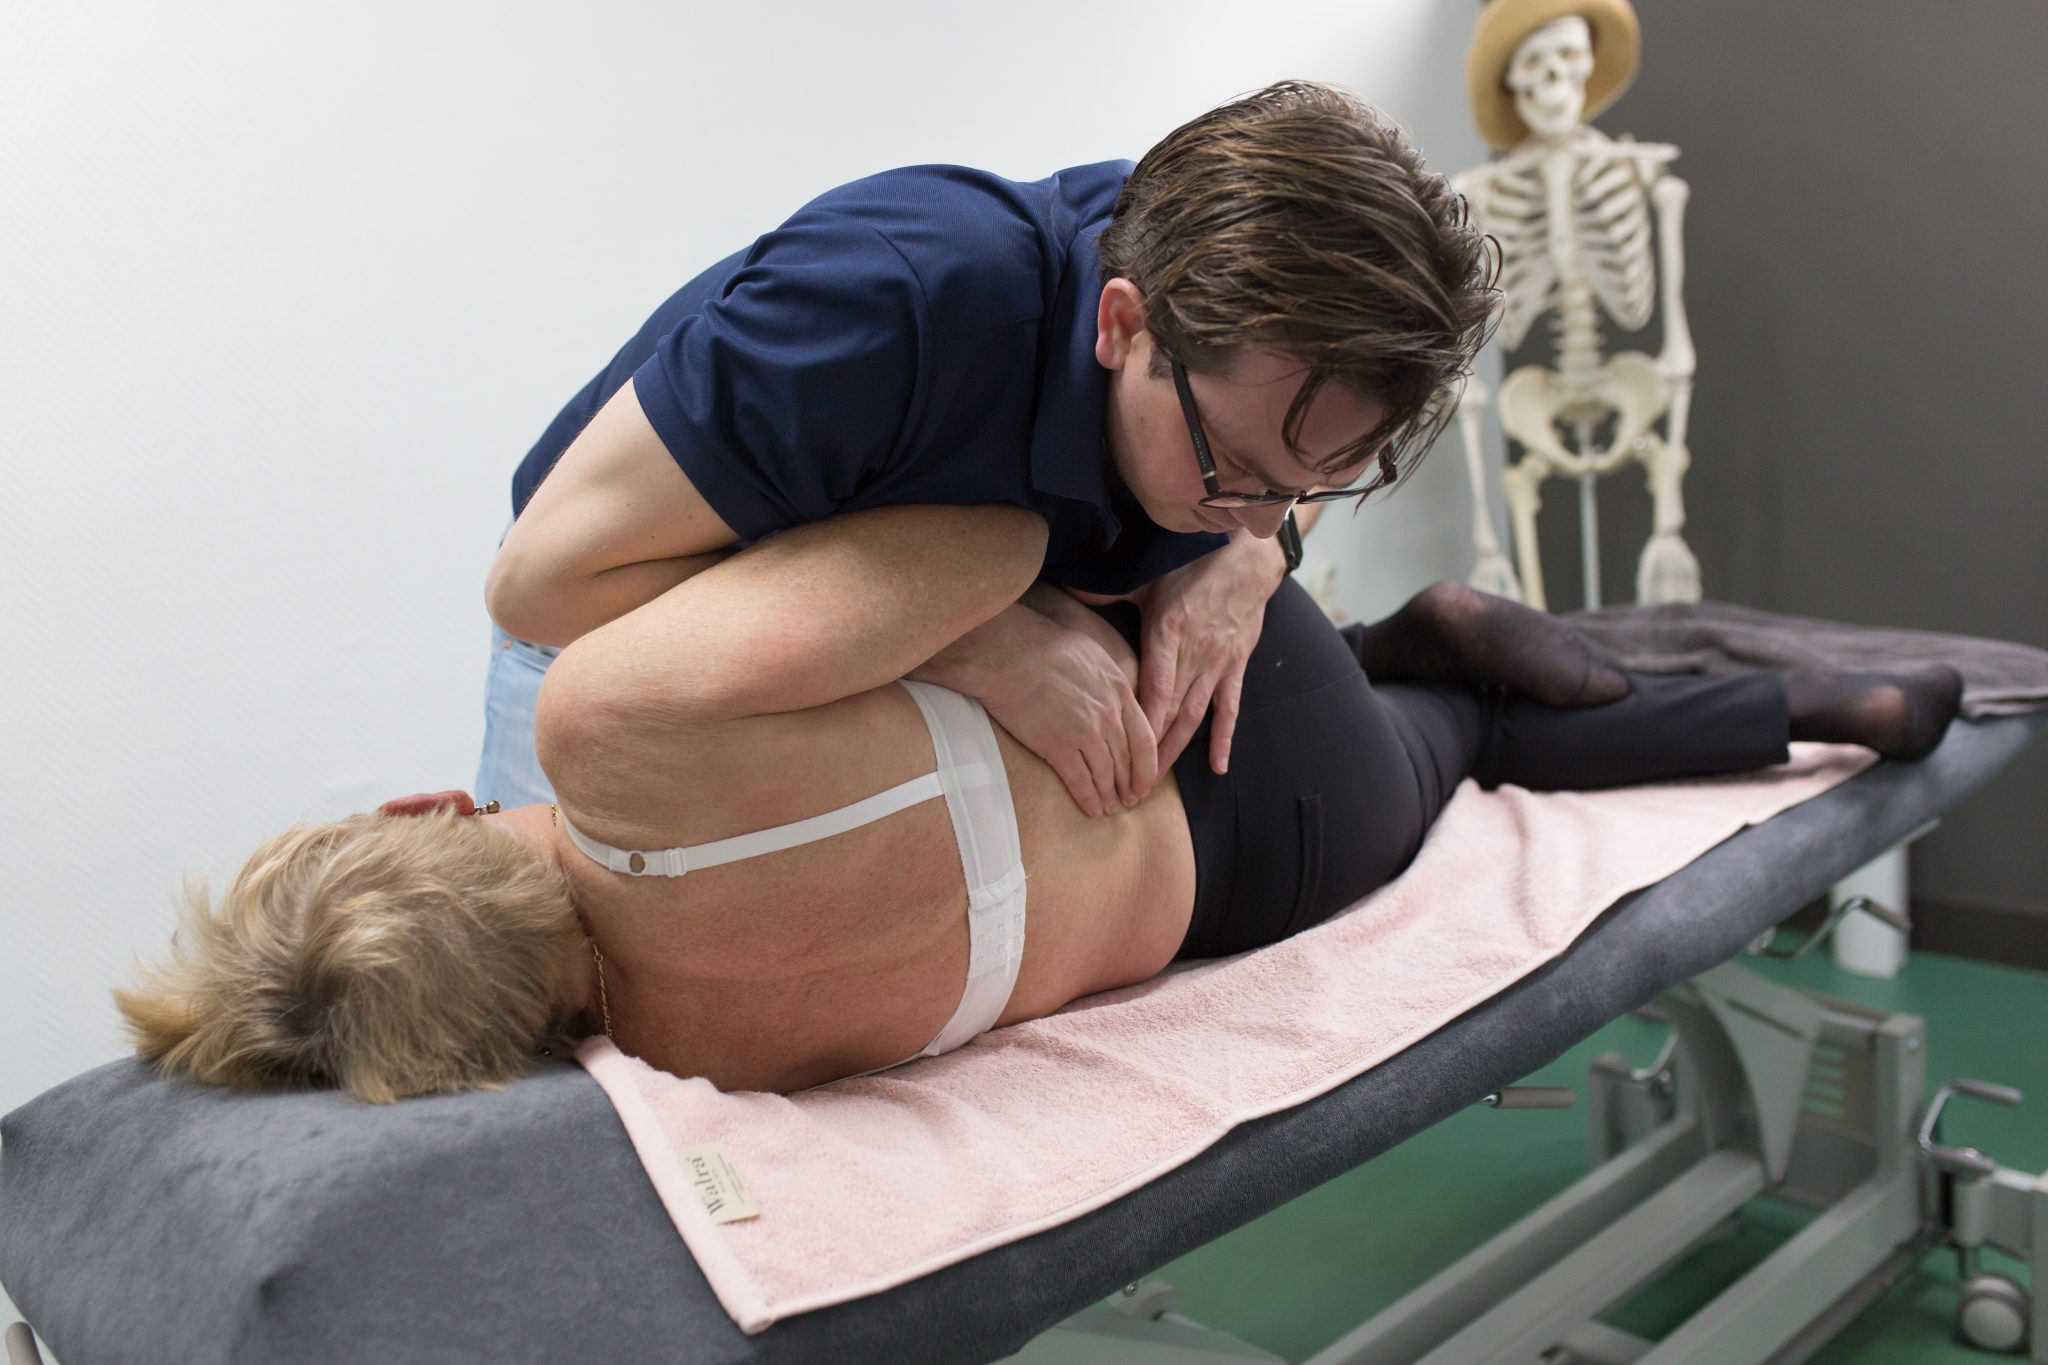 bedrijfsfotografie fysiotherapiepraktijk laura elkhuizen fotografie